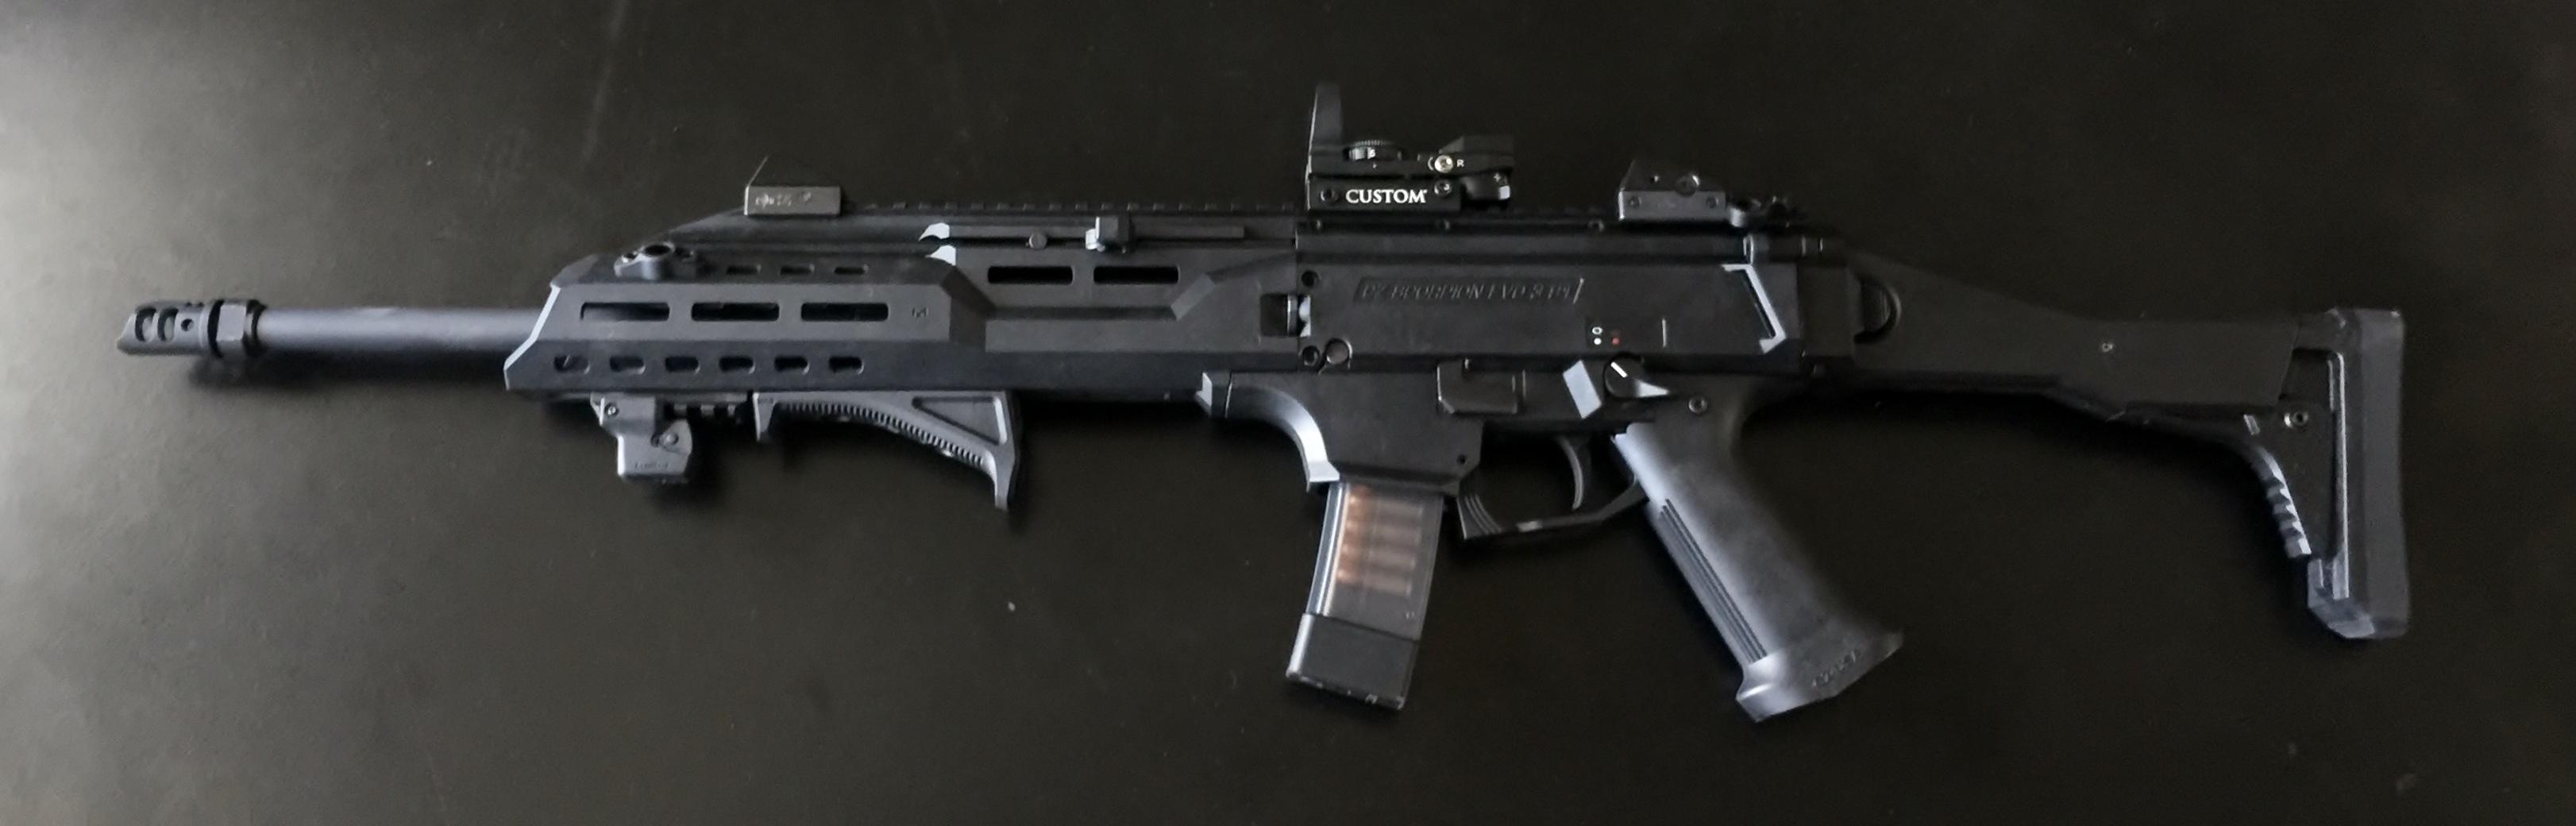 Do you have a handgun Caliber Carbine....-cz-scorpion.jpg